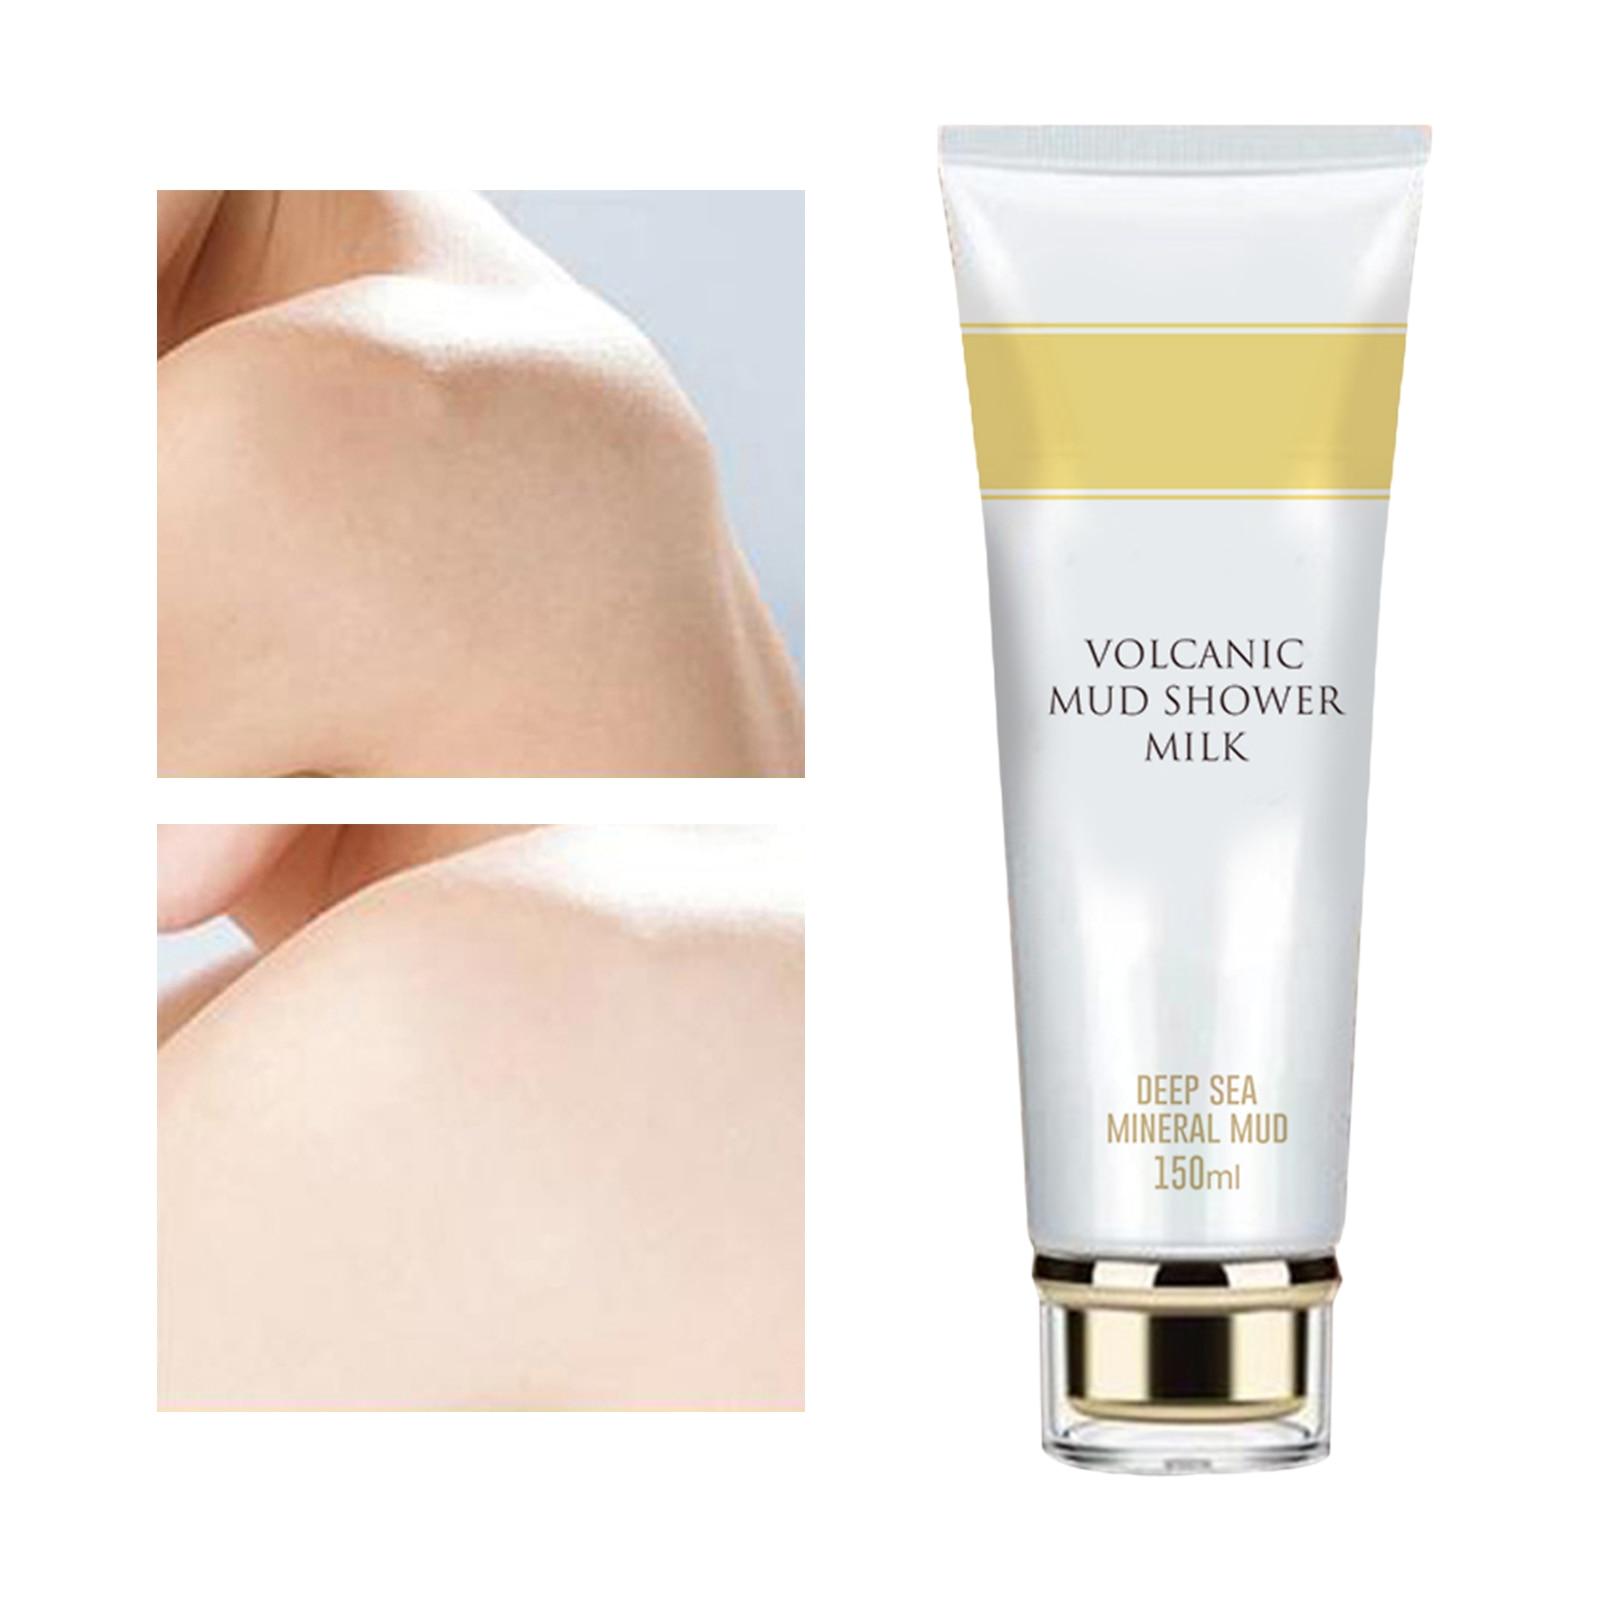 Volcanic Mud Shower Gel Whitening Bath Milk Cream Body Wash Exfoliating Body Lotion Brightening for Men Women Skin Lightening